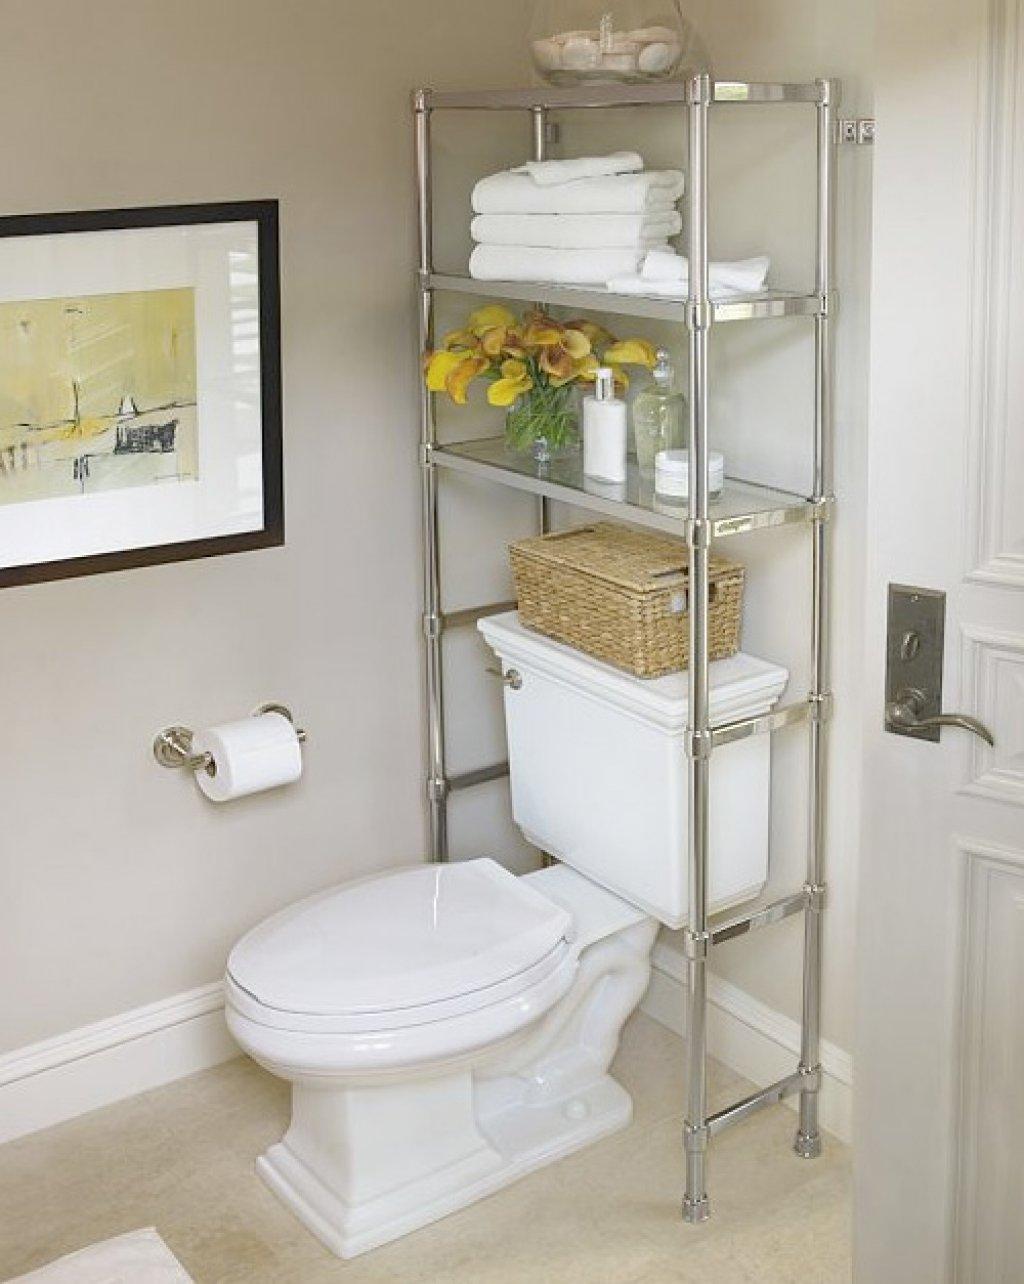 Дизайн узкой ванной комнаты (75 фото)